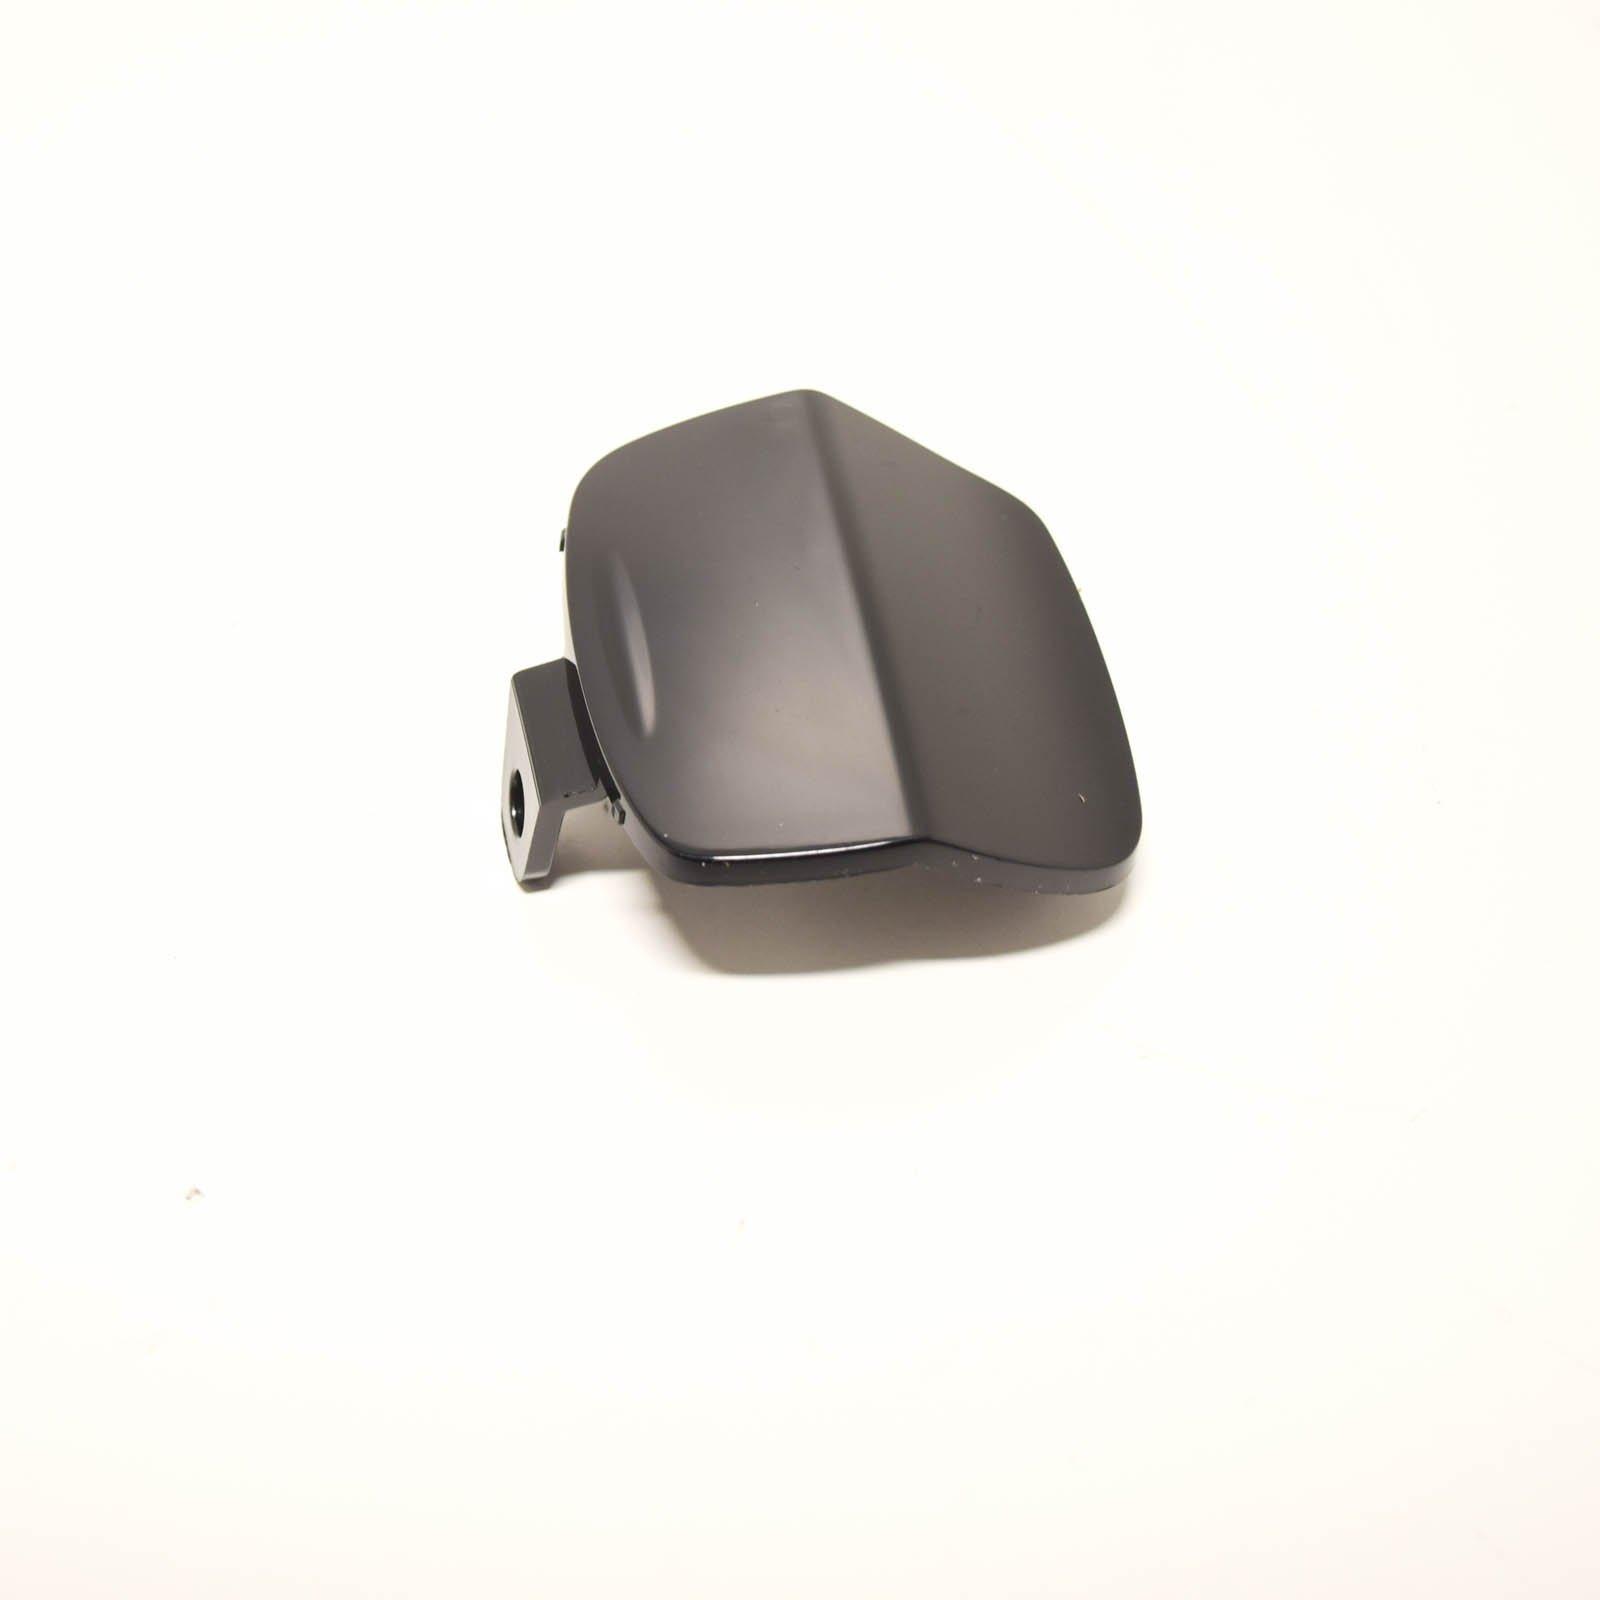 VOLVO V50 Rear Bumper Towing Eye Cover 39886117 NEW GENUINE